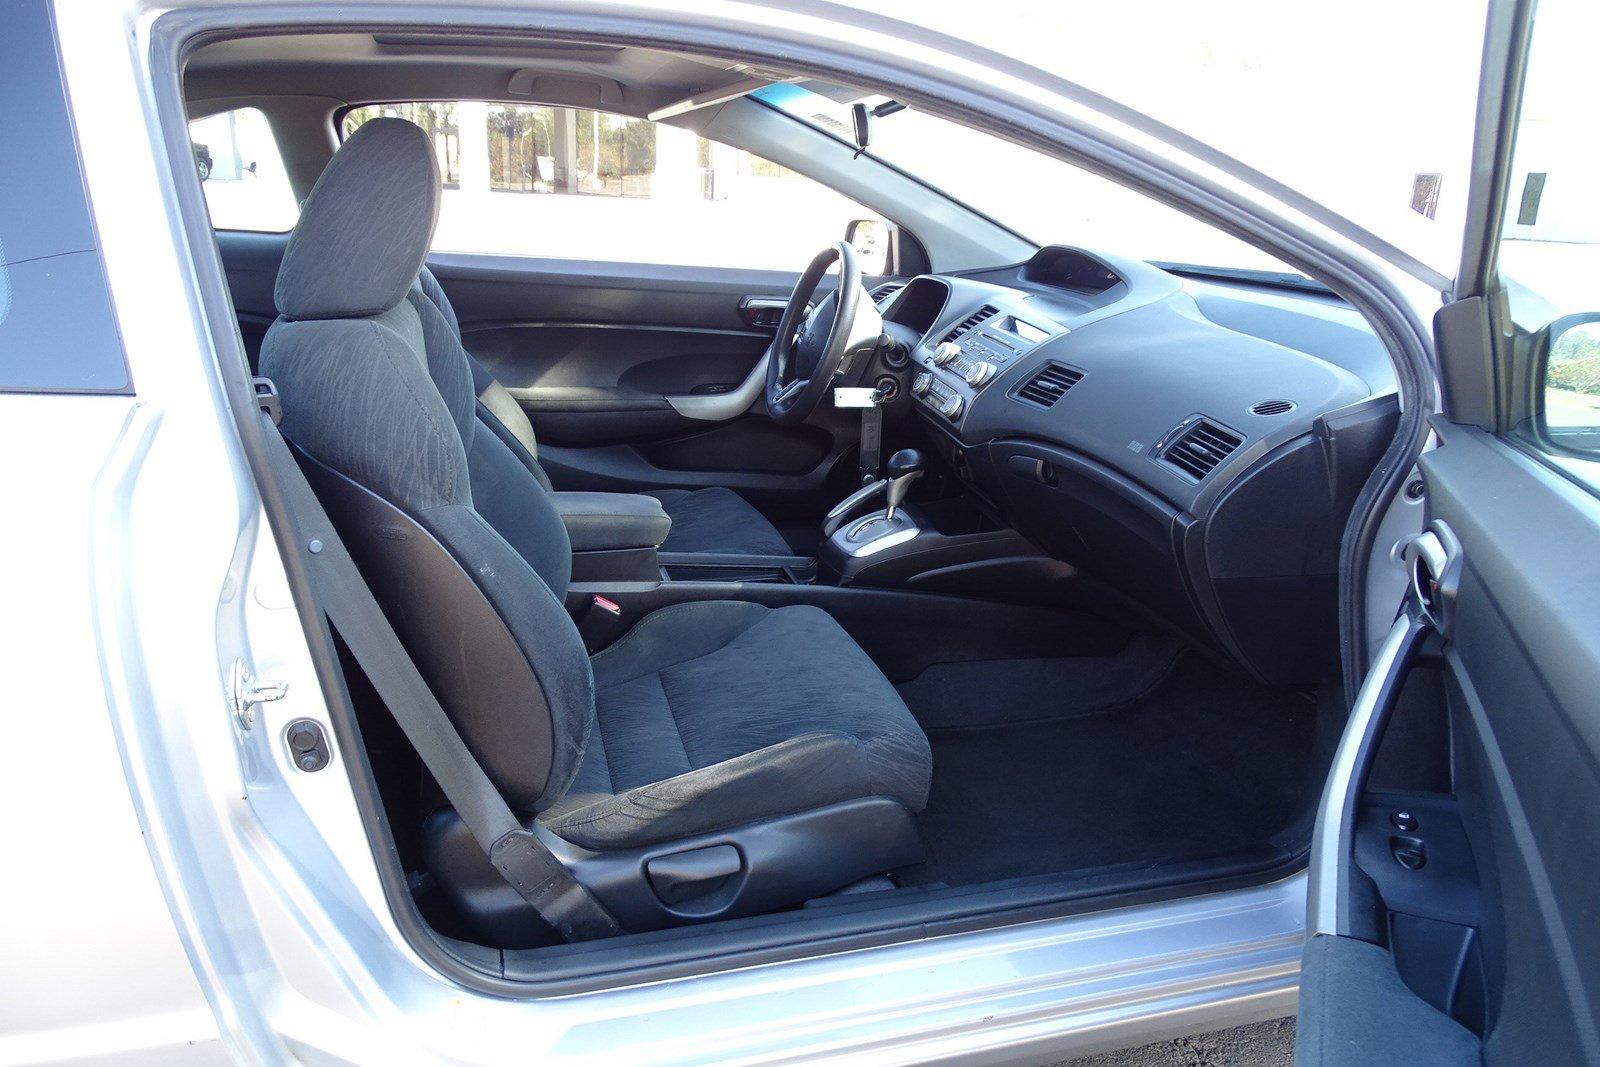 Pre-Owned 2008 Honda Civic EX